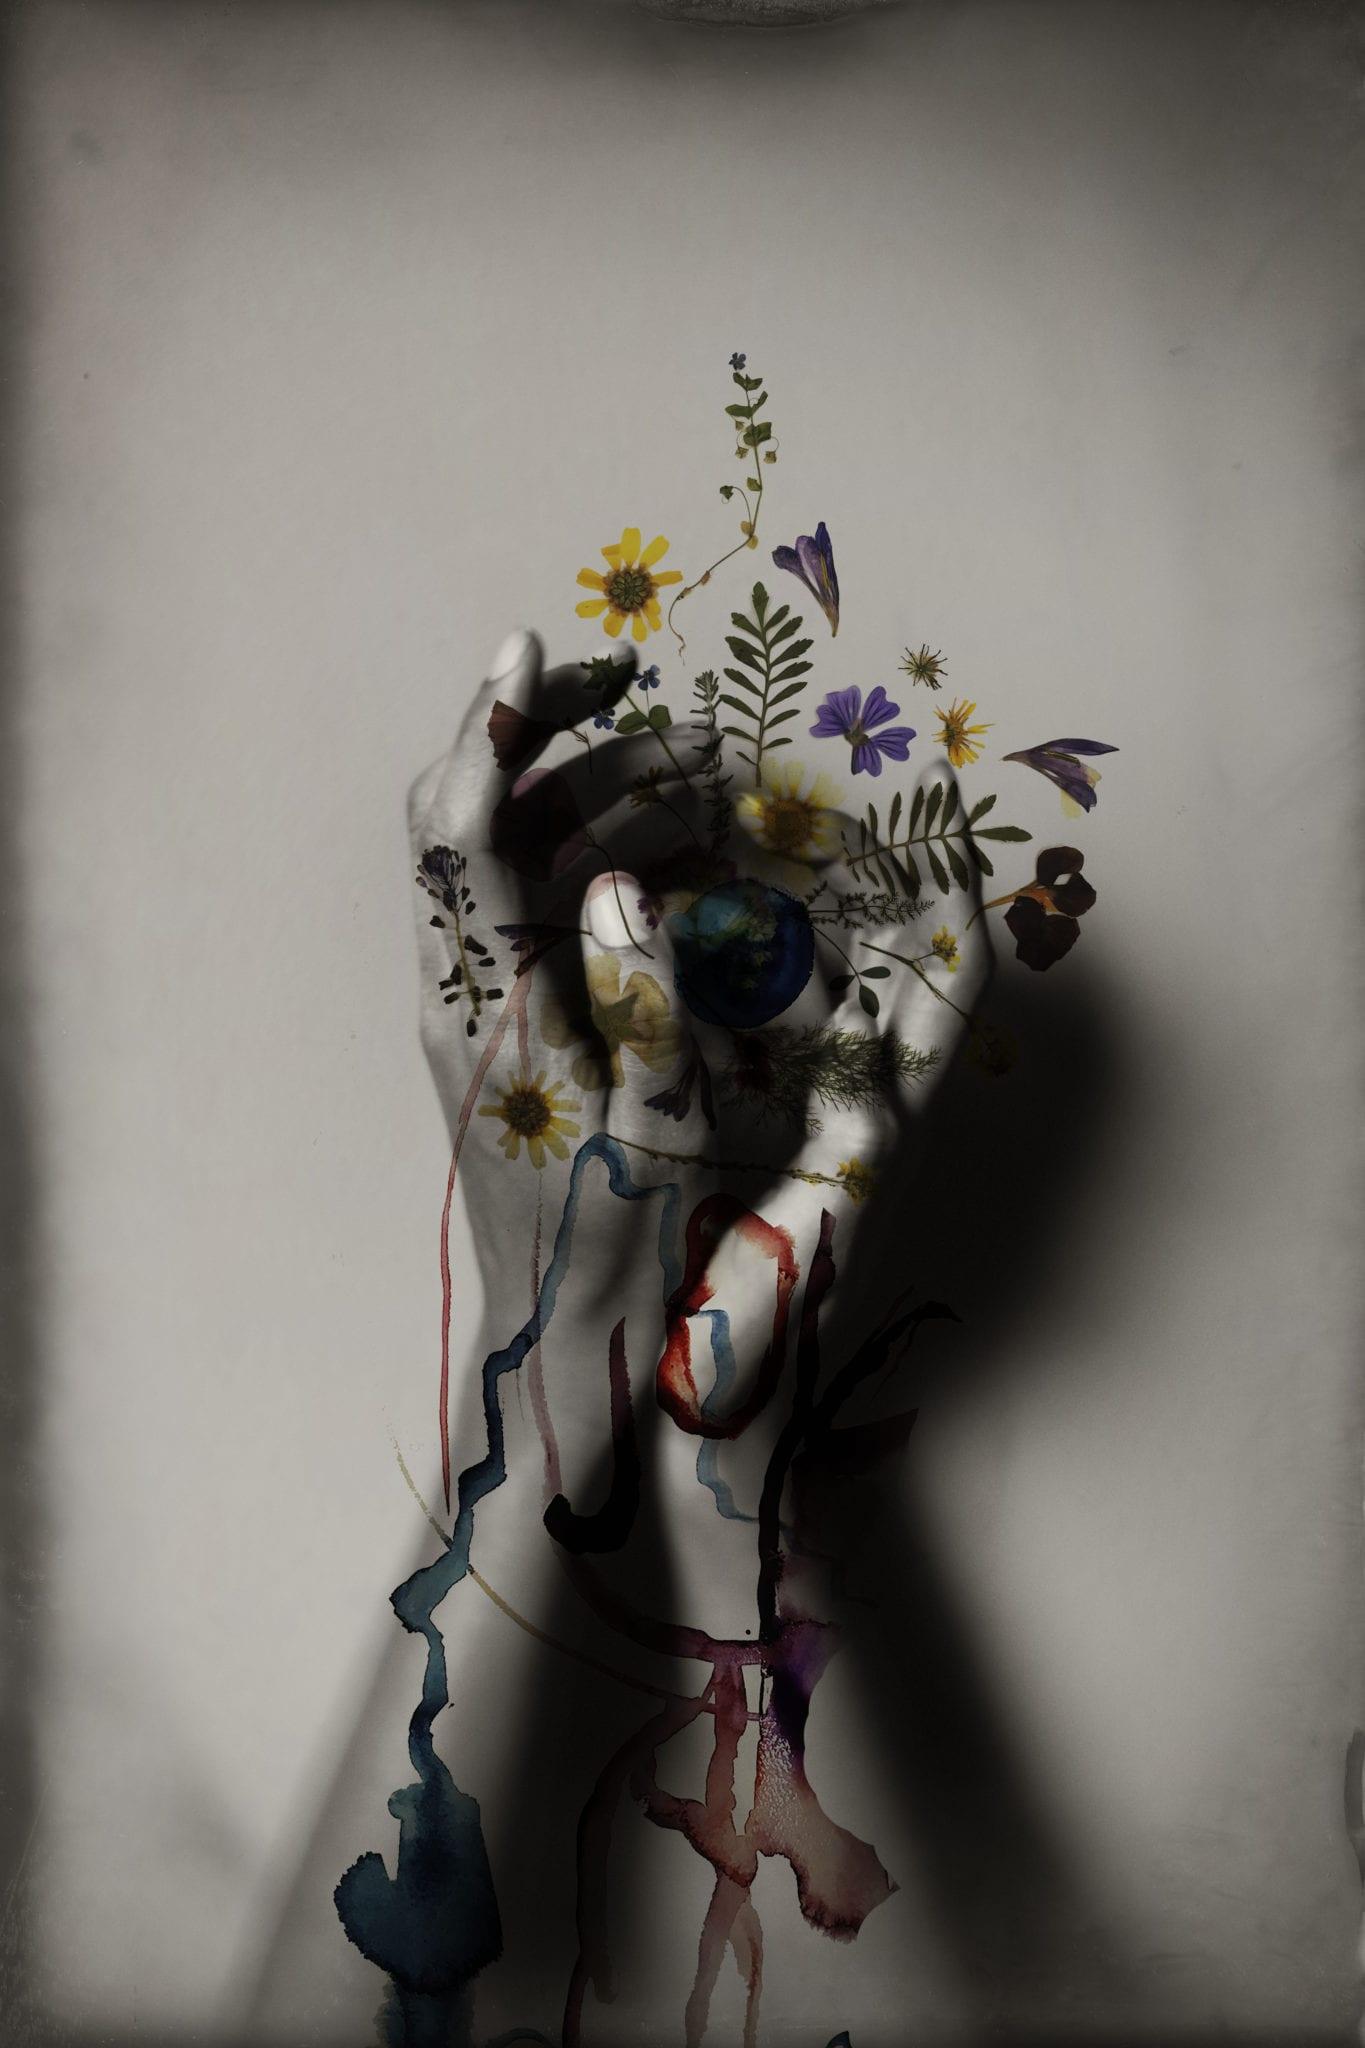 'A Fierce Prayer'   © Anouska Beckwith and Anika Nixdorf. Courtesy of Anouska Beckwith